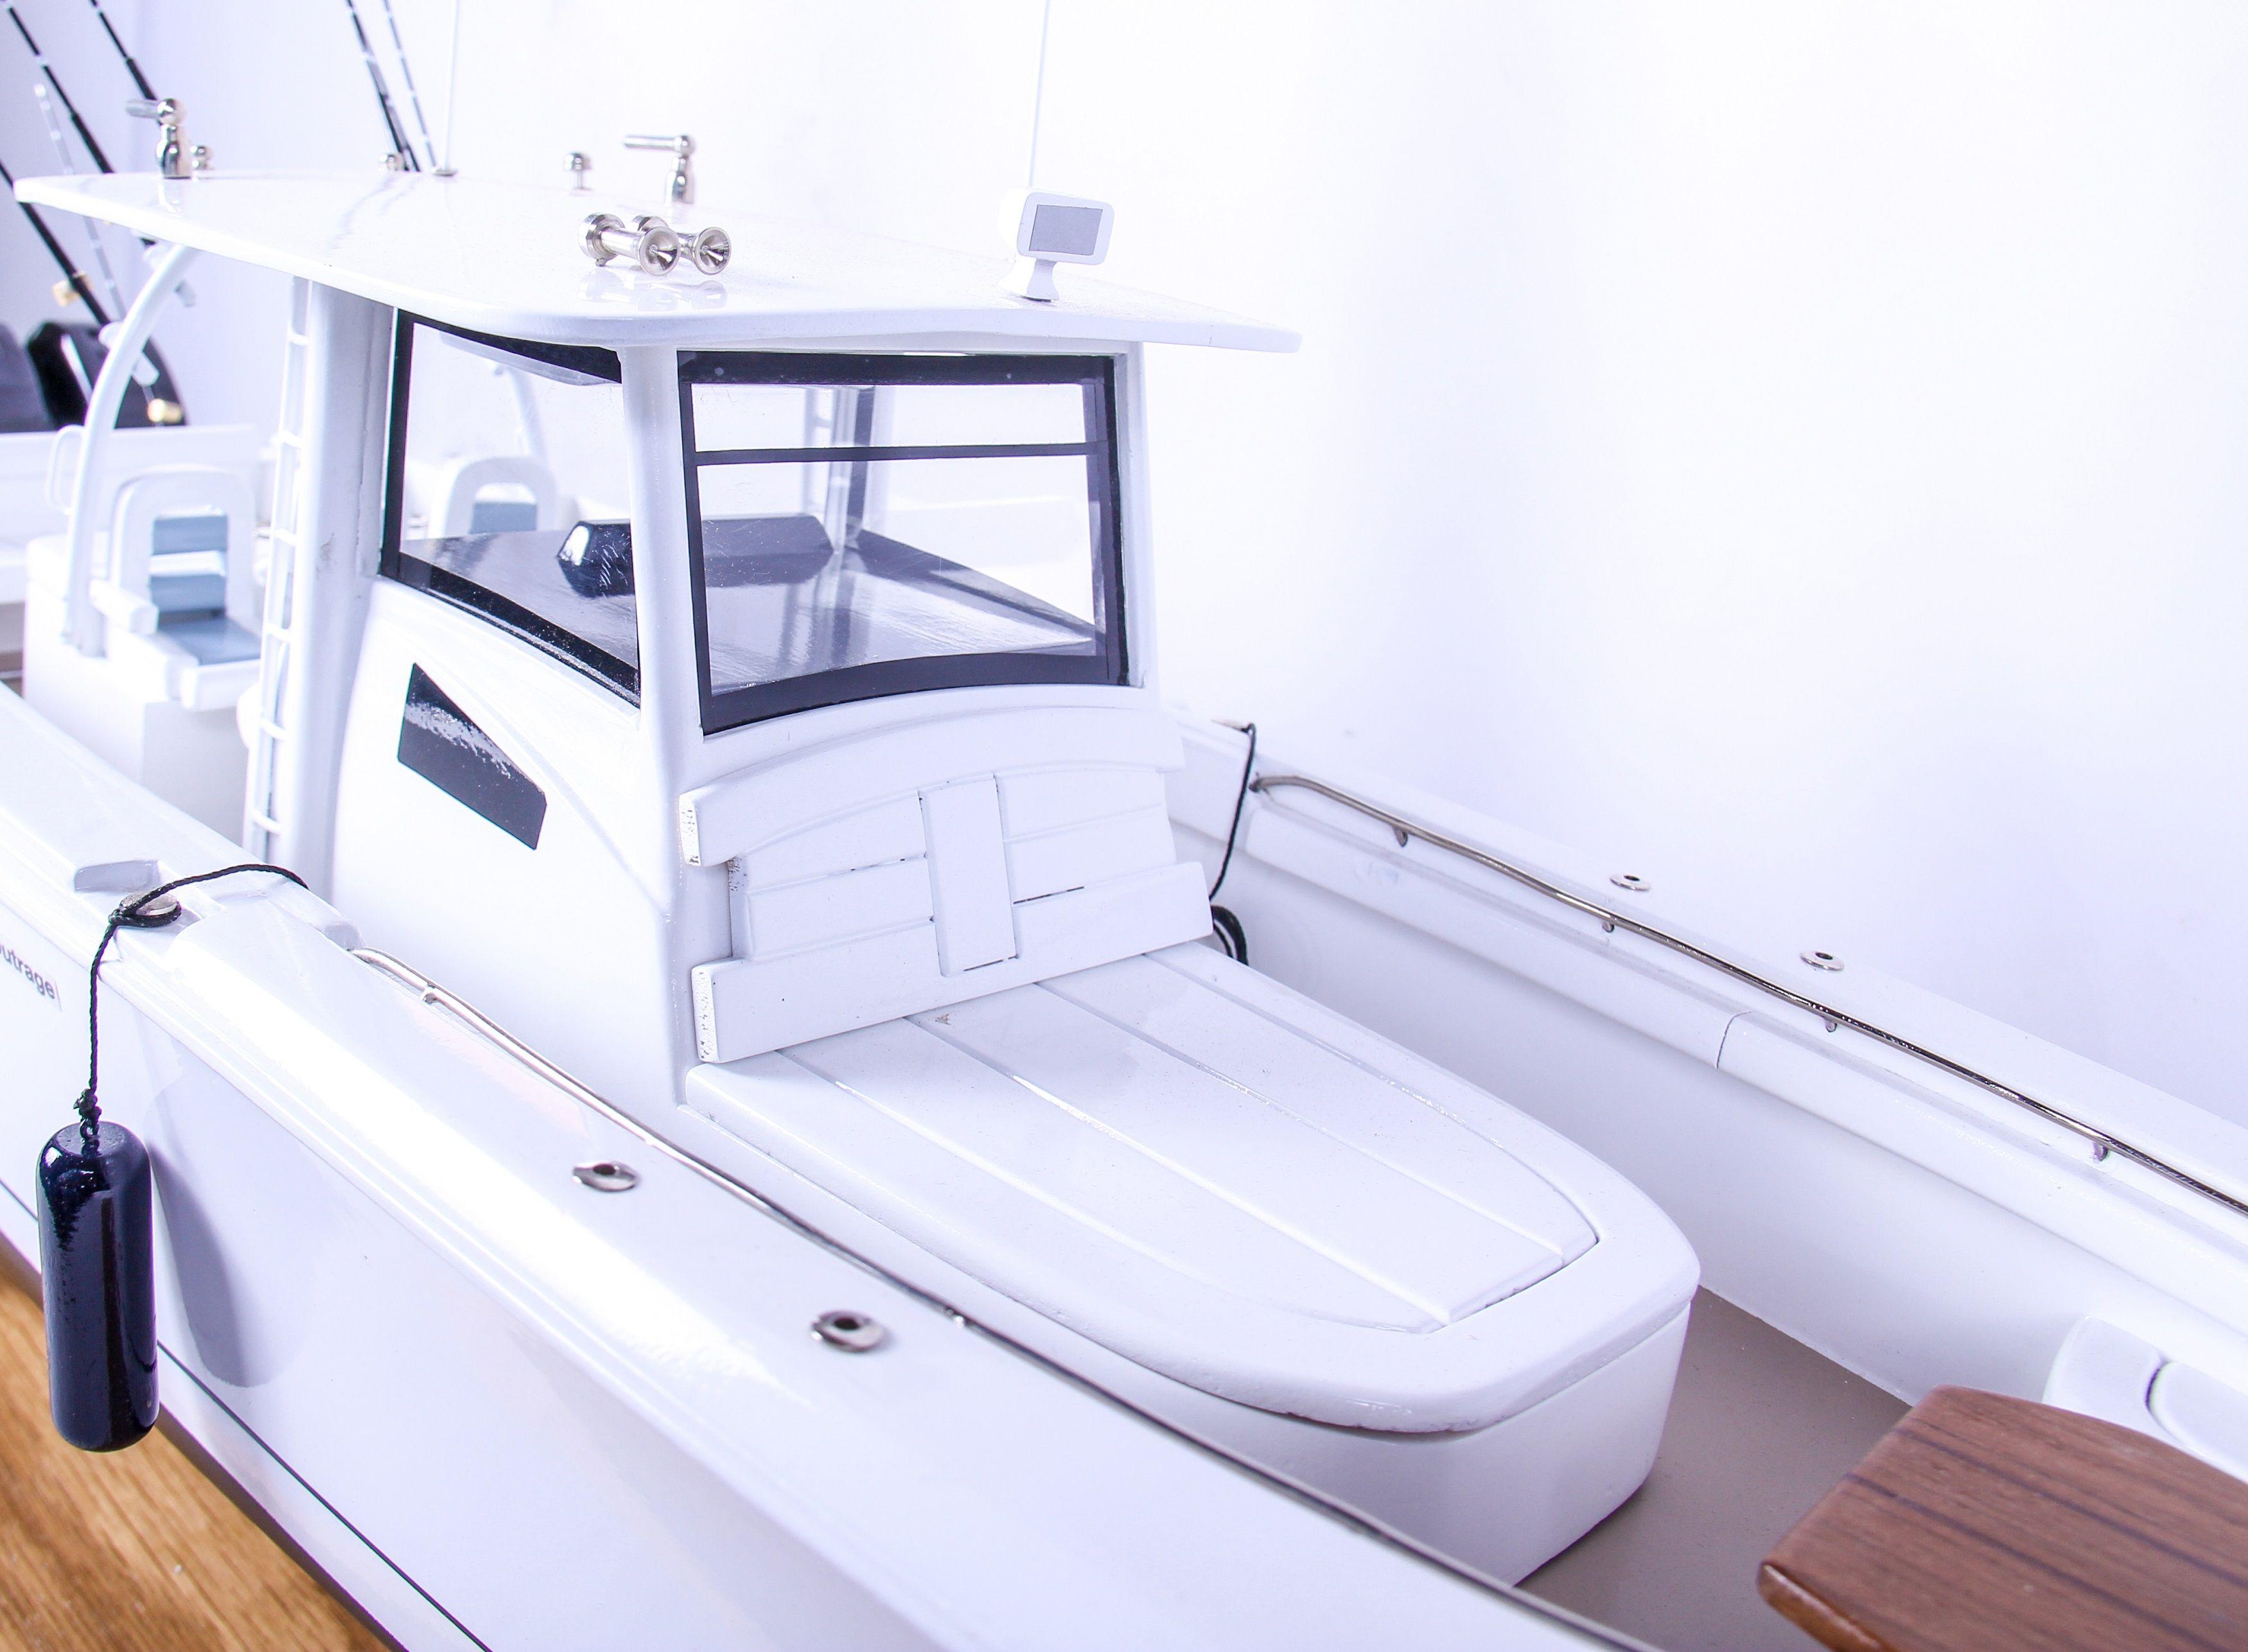 1686-9519-Boston-Whaler-Outrage-370-Model-Boat